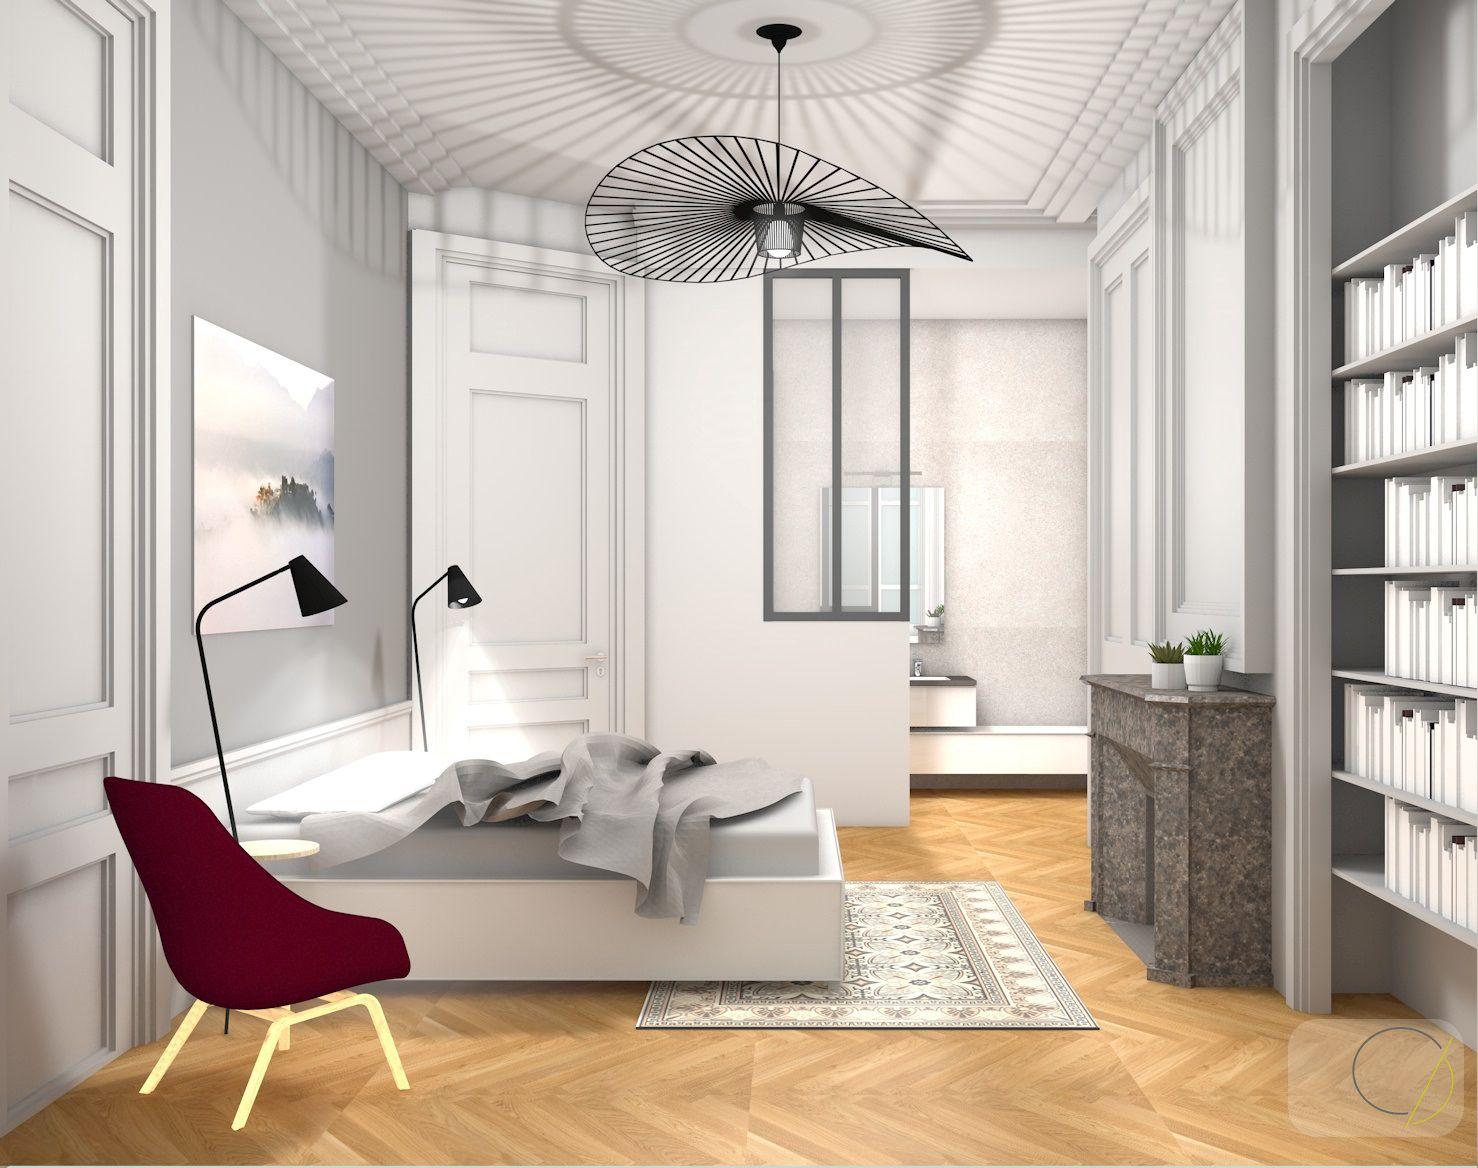 chambre parentale avec sa fameuse suspension vertigo r alisations pro pinterest chambres. Black Bedroom Furniture Sets. Home Design Ideas